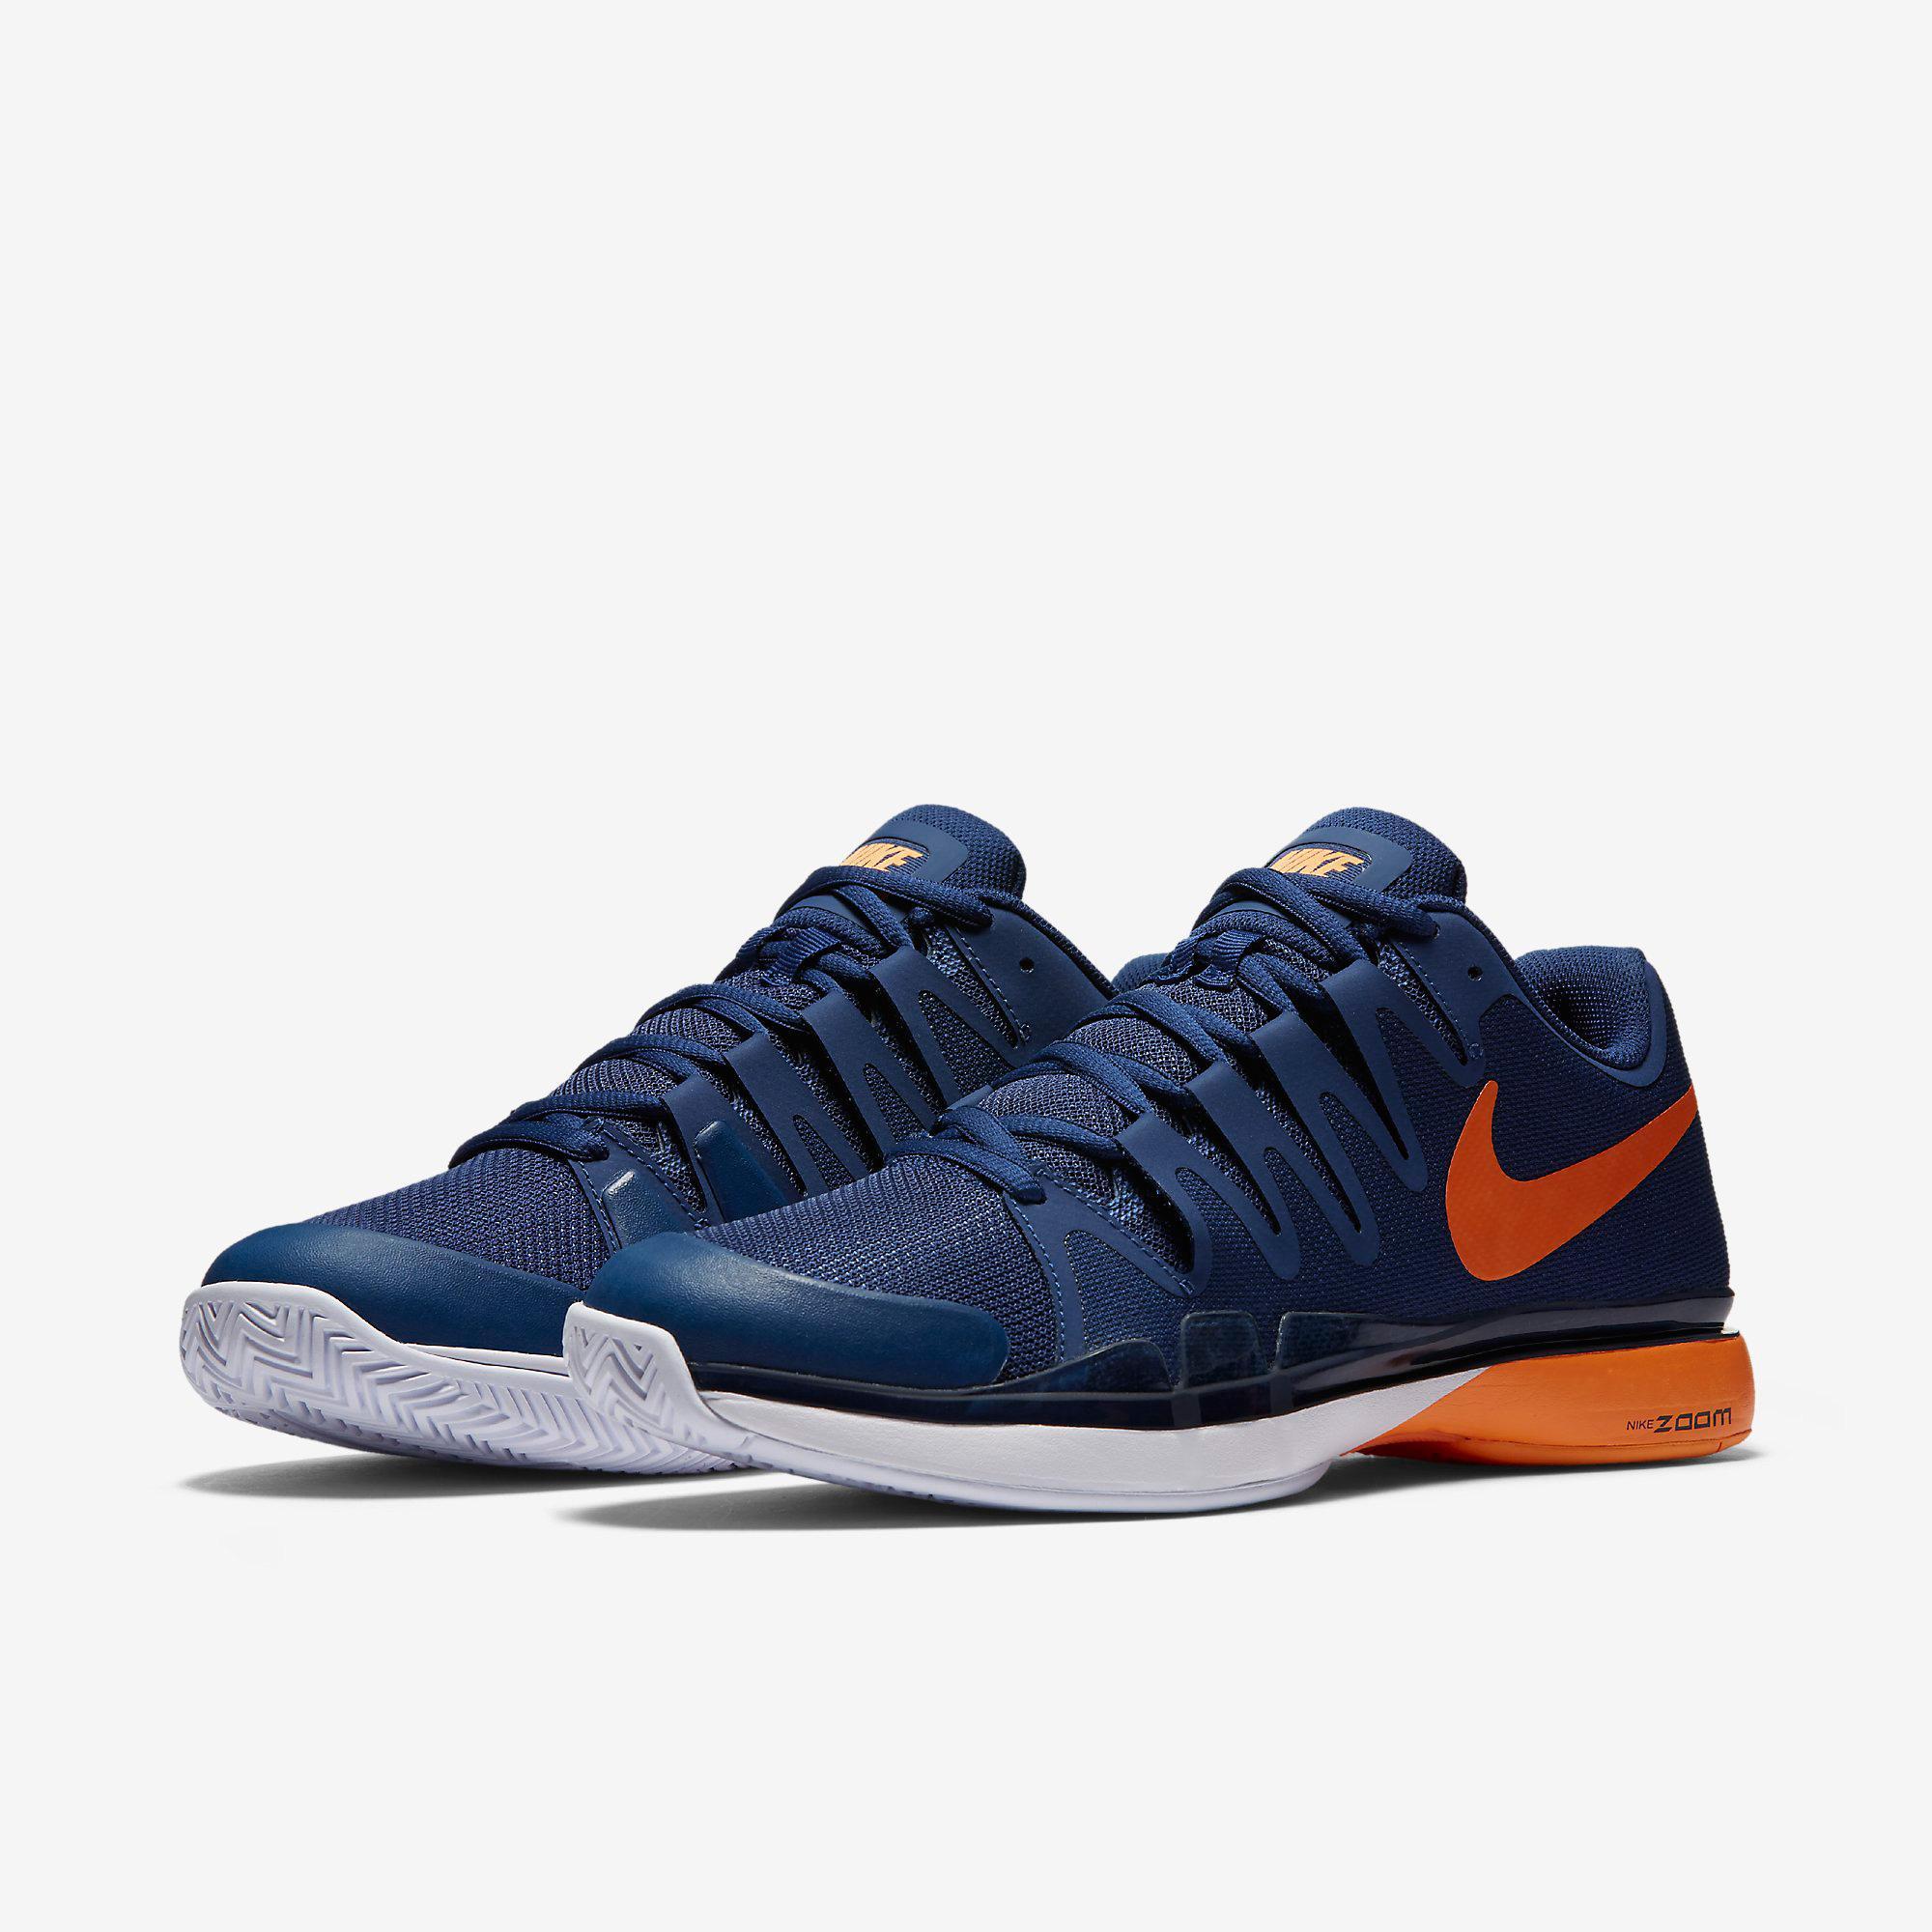 61d47b6f9b8d4 Nike Mens Zoom Vapor 9.5 Tour Tennis Shoes - Coastal Blue ...